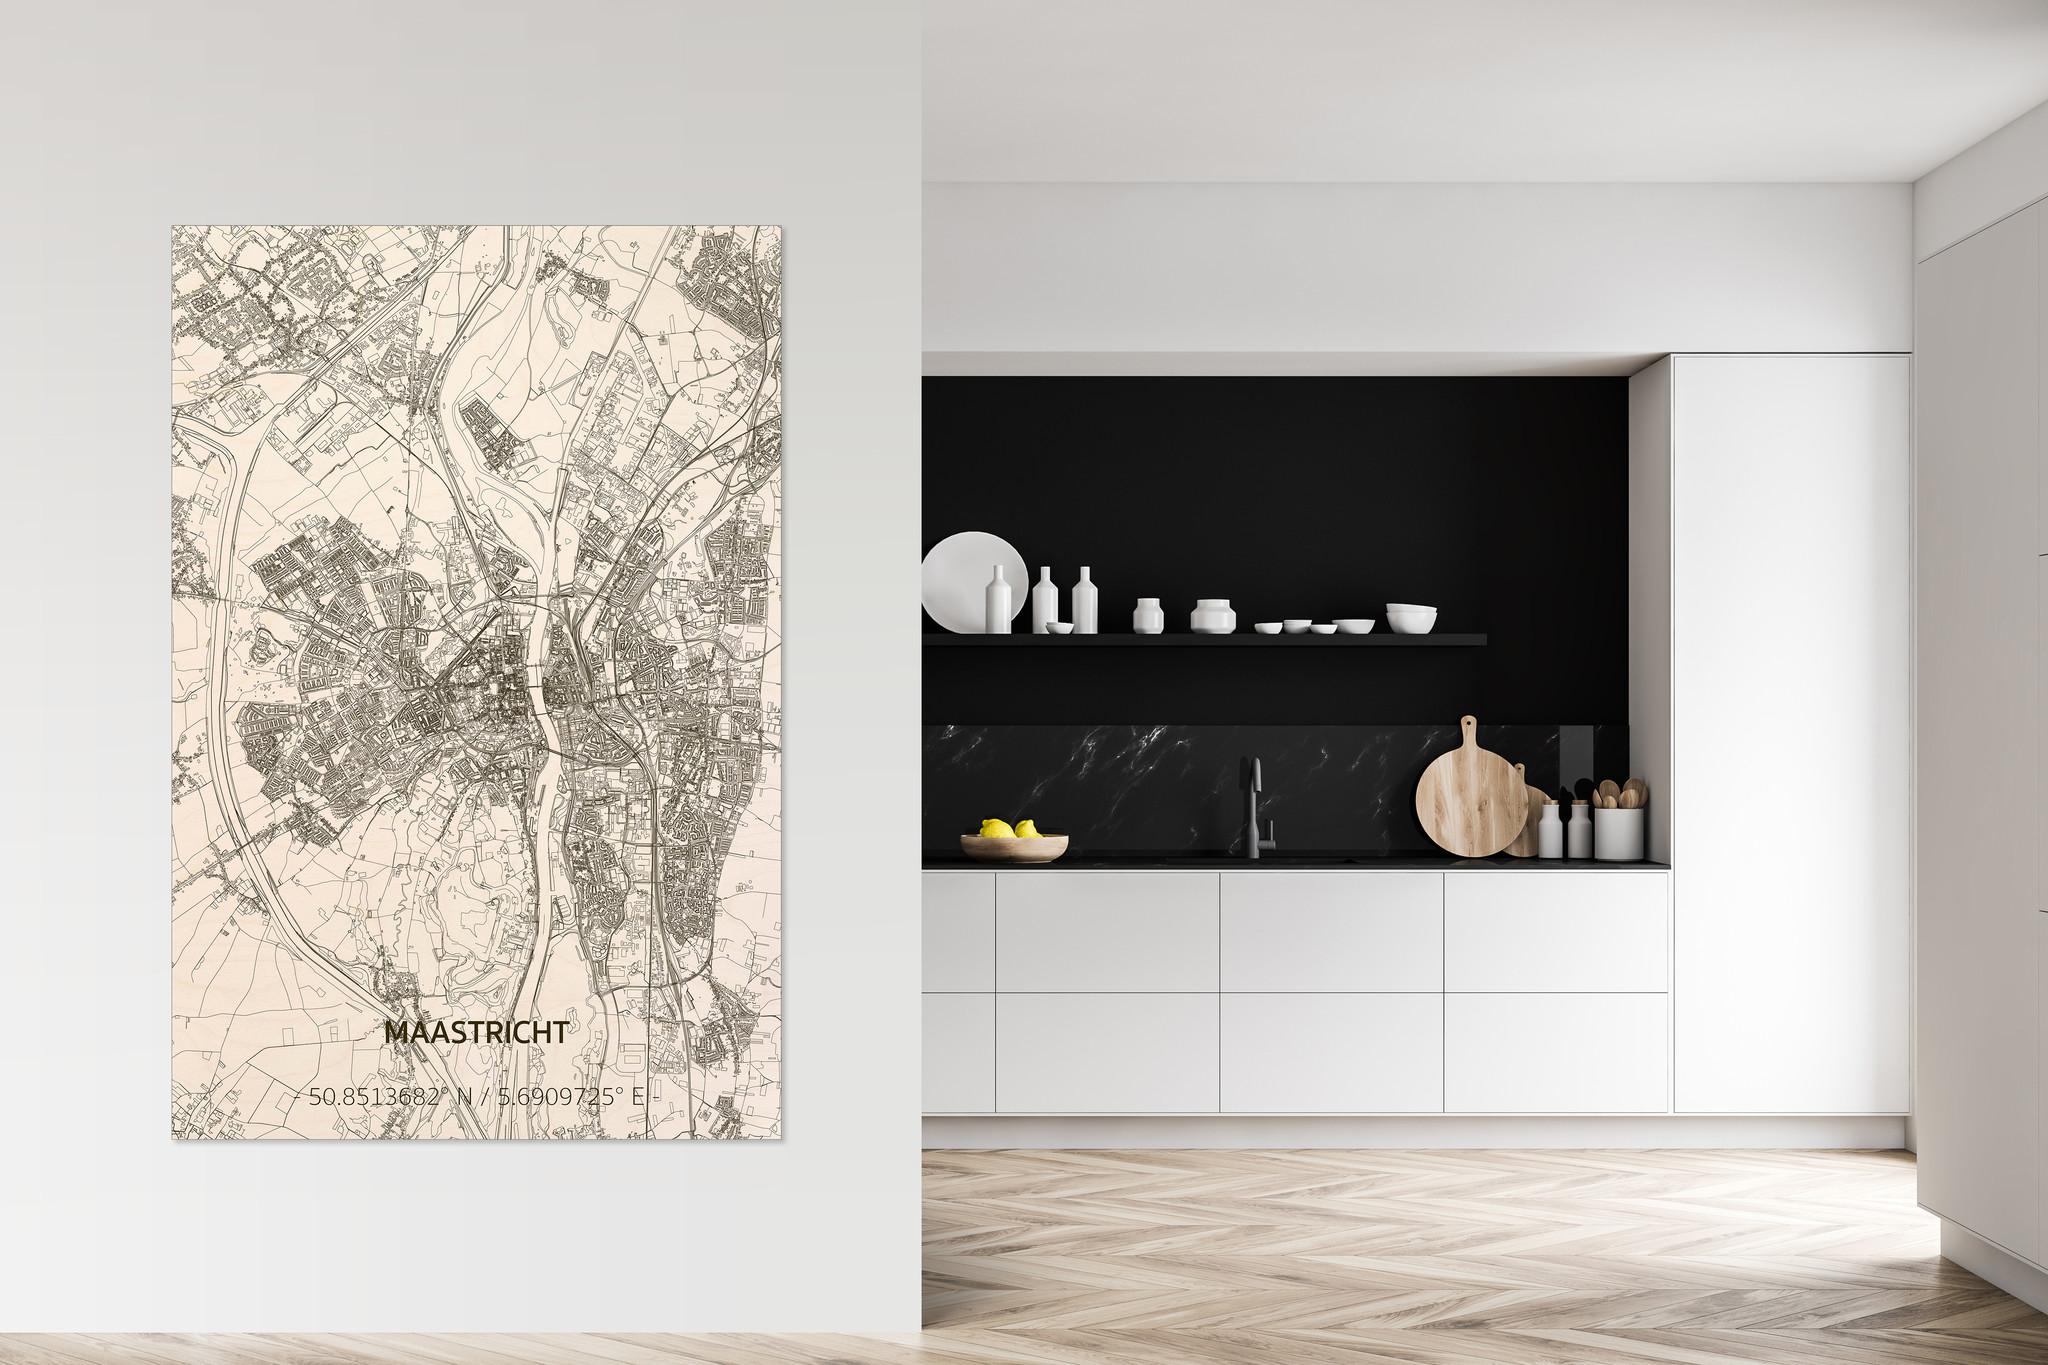 Wanddekoration aus Holz Wandbild Maastricht XL-2